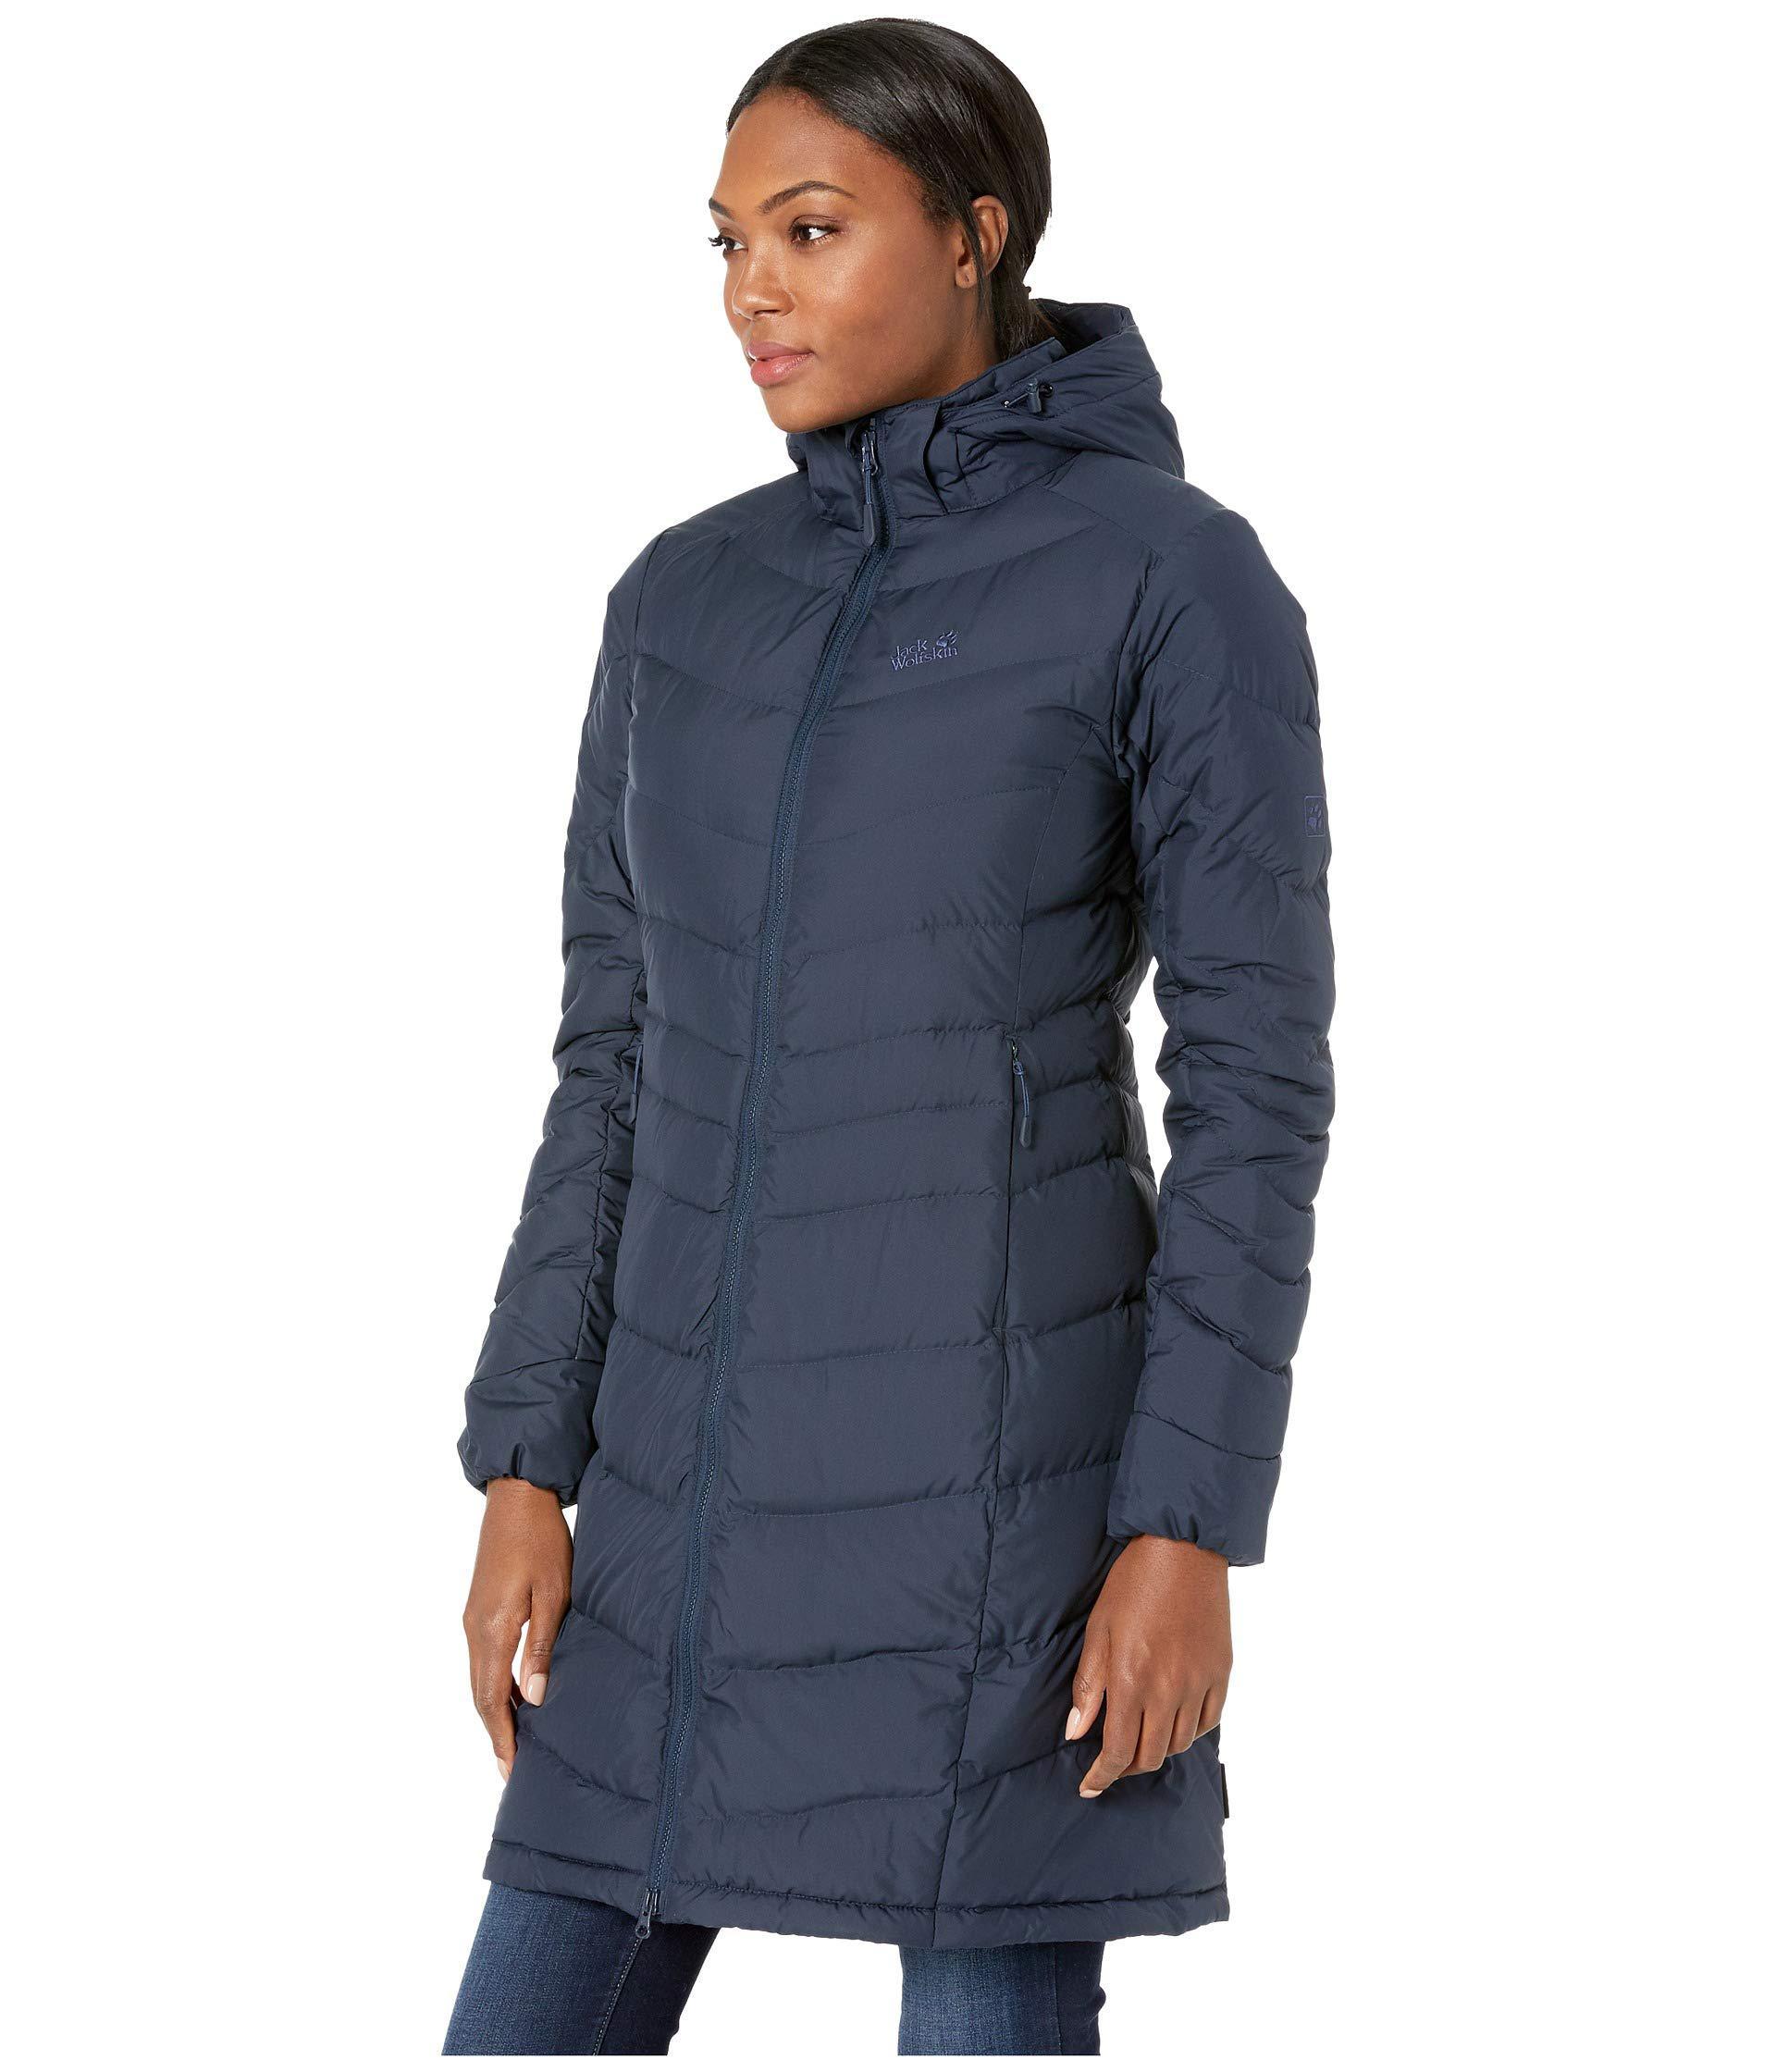 a69eb3cd5d9 Jack Wolfskin Selenium Coat (midnight Blue) Women's Coat in Blue - Lyst